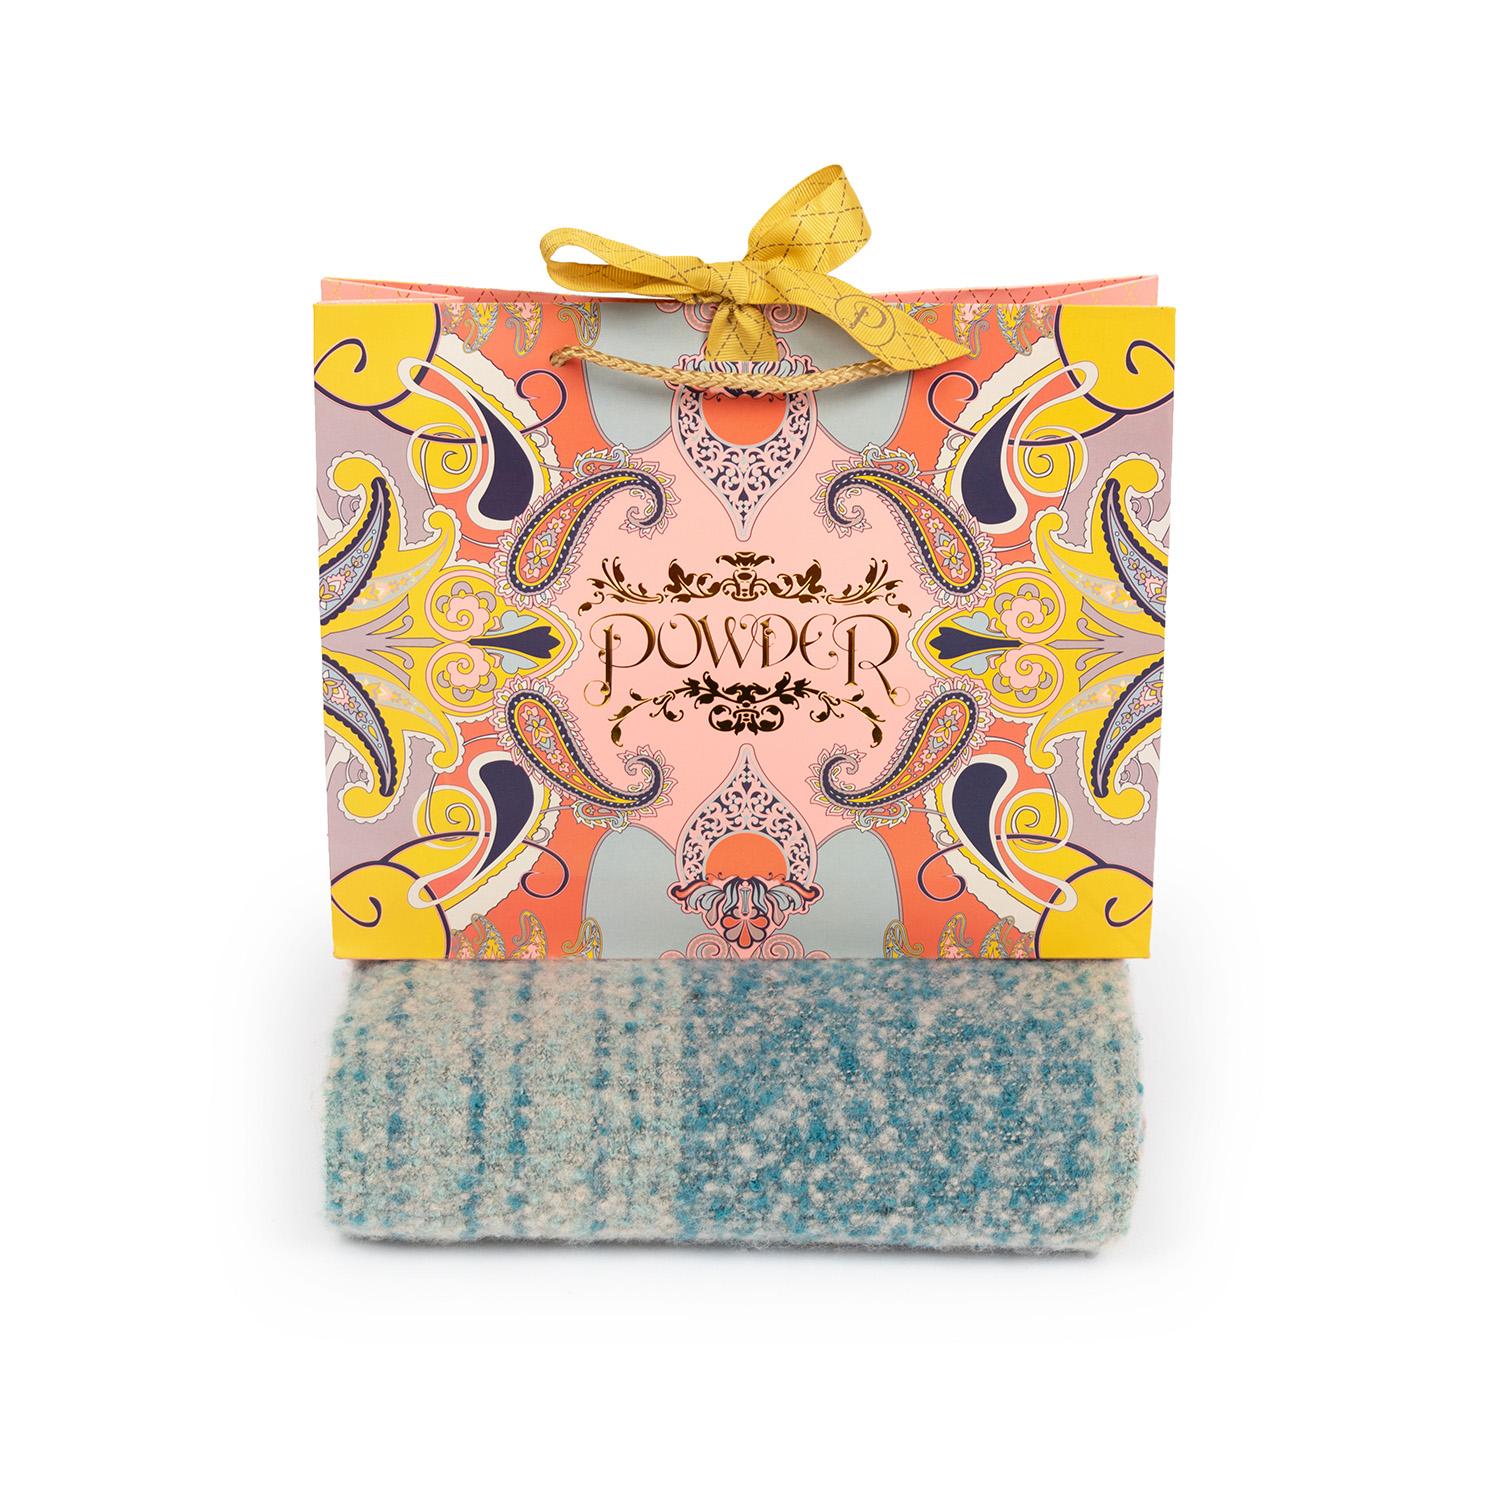 Powder – Teal Mix Maggie Scarf with Powder Presentation Gift Bag